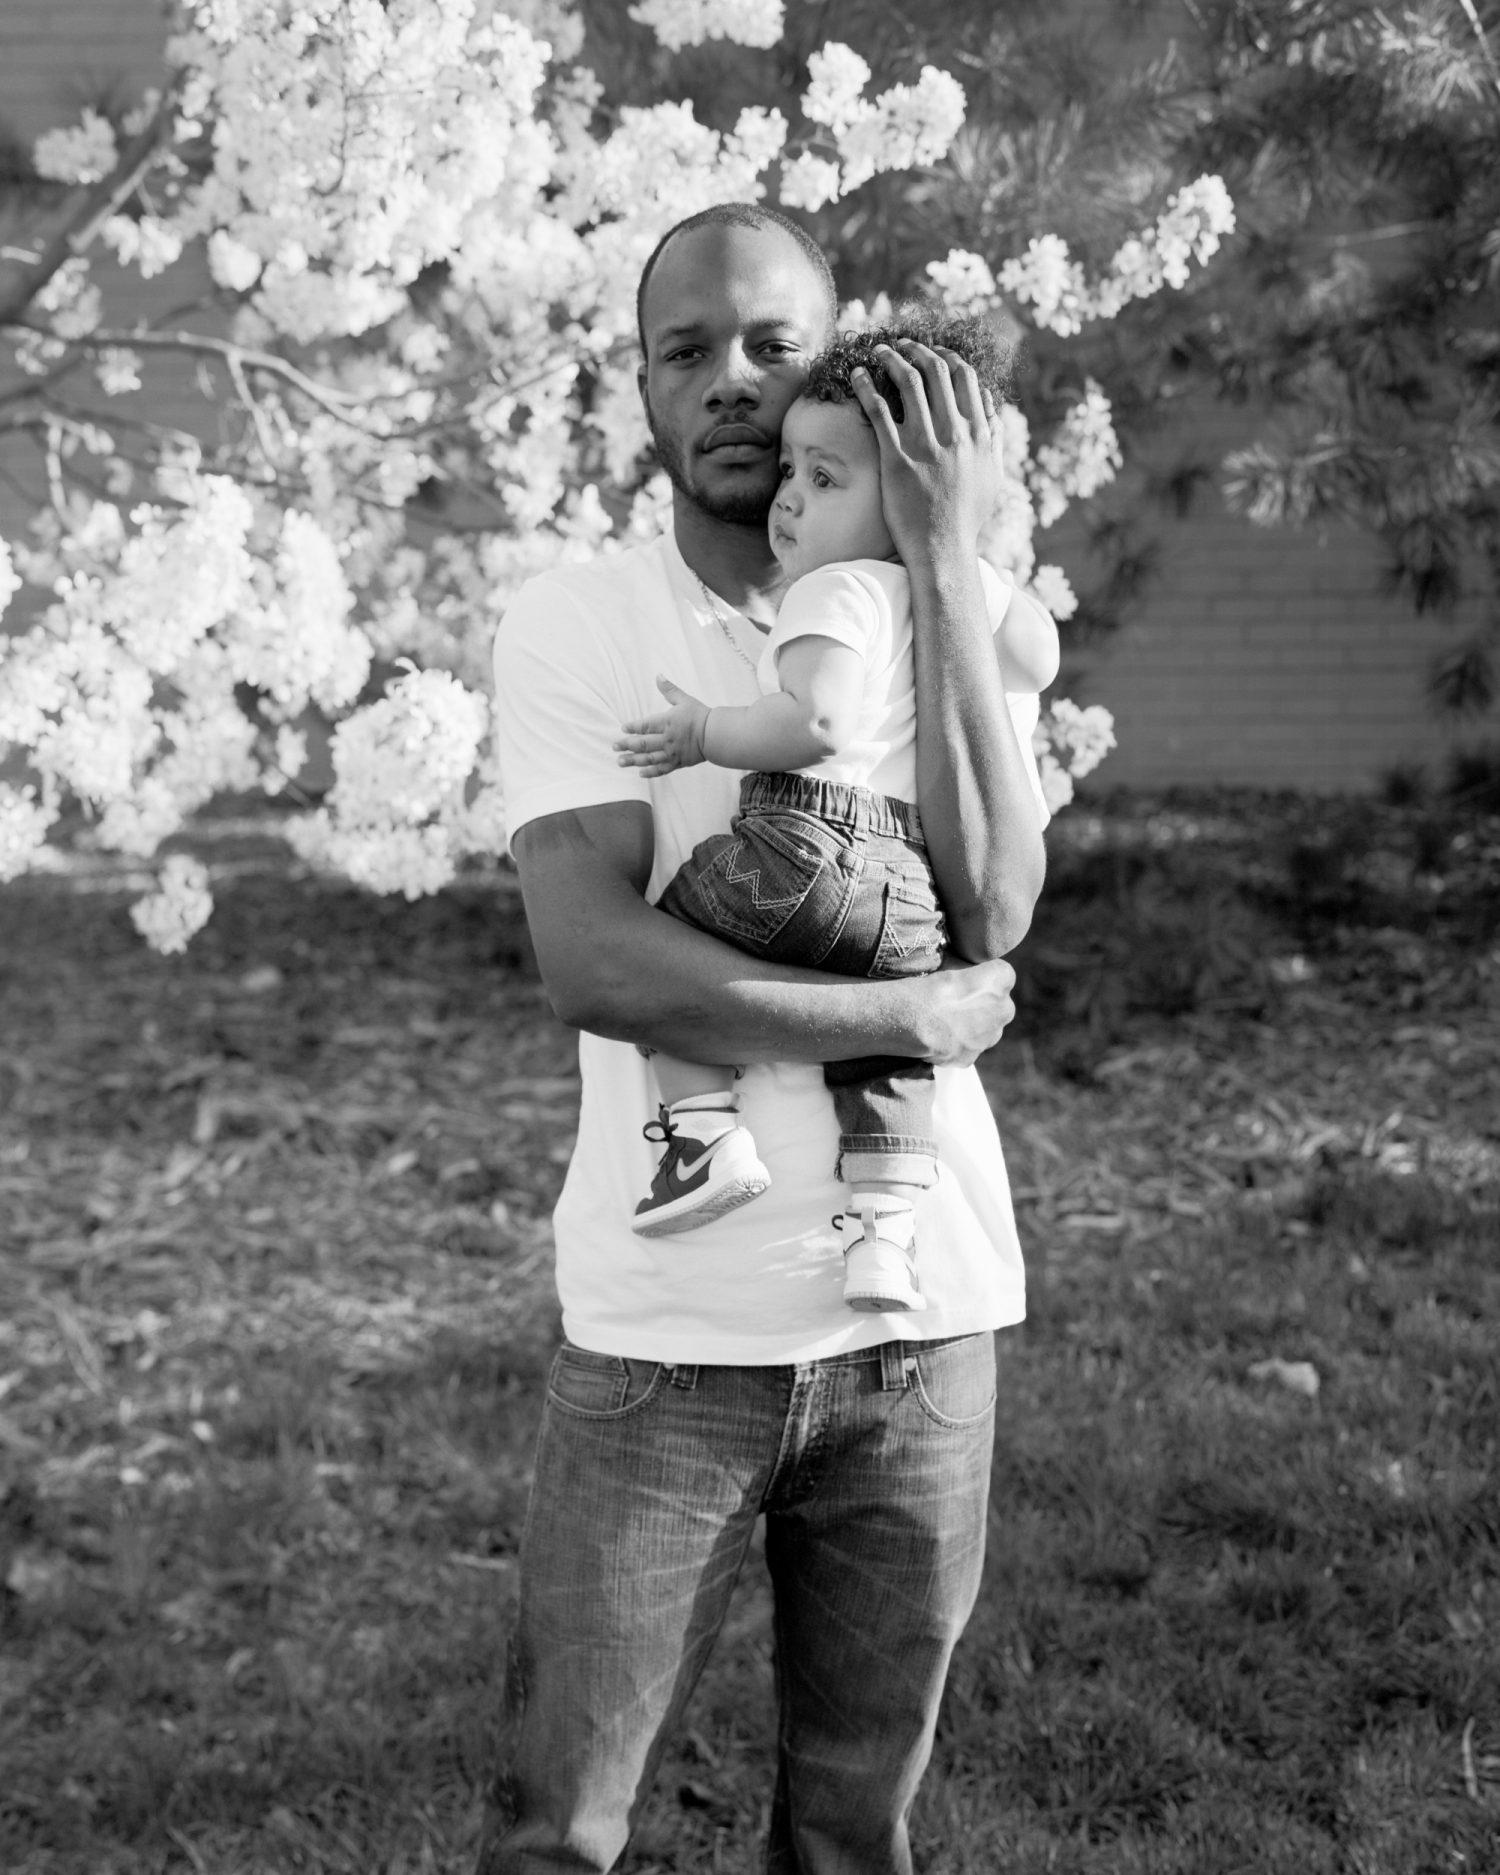 Jerrod and Junior (talking about fatherhood), 2019